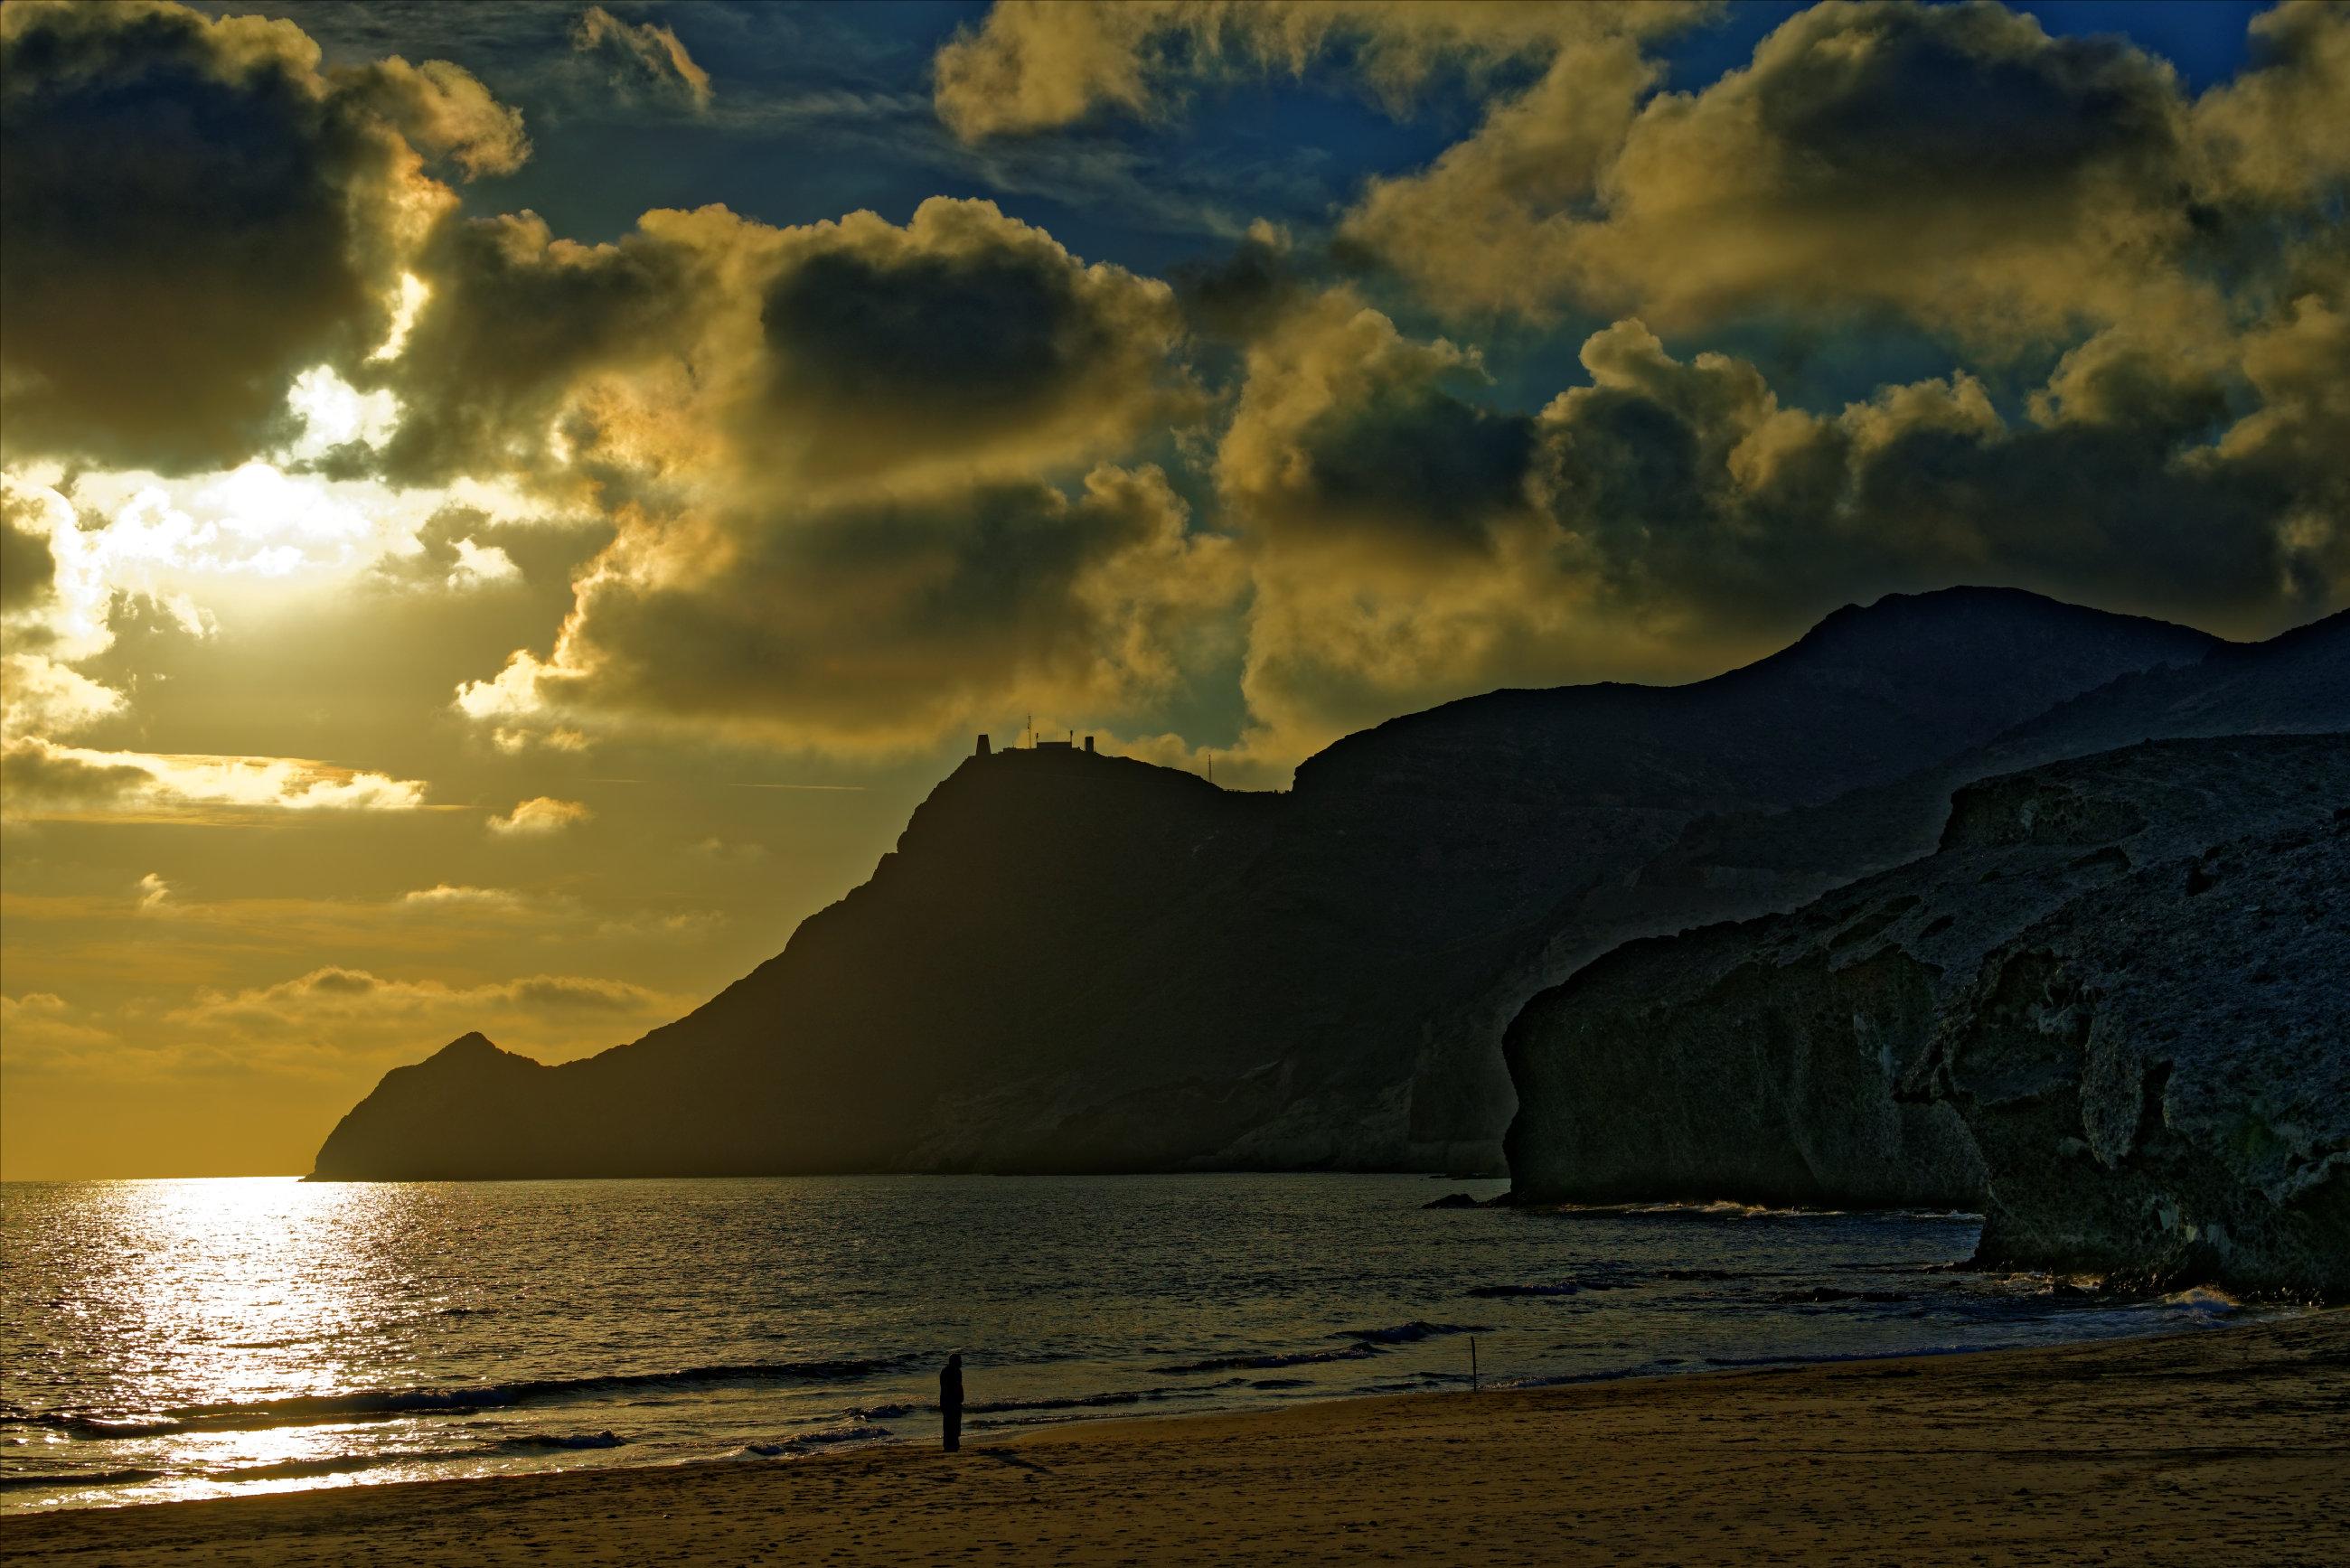 151104-San Jose-Playa de Monsul (37)